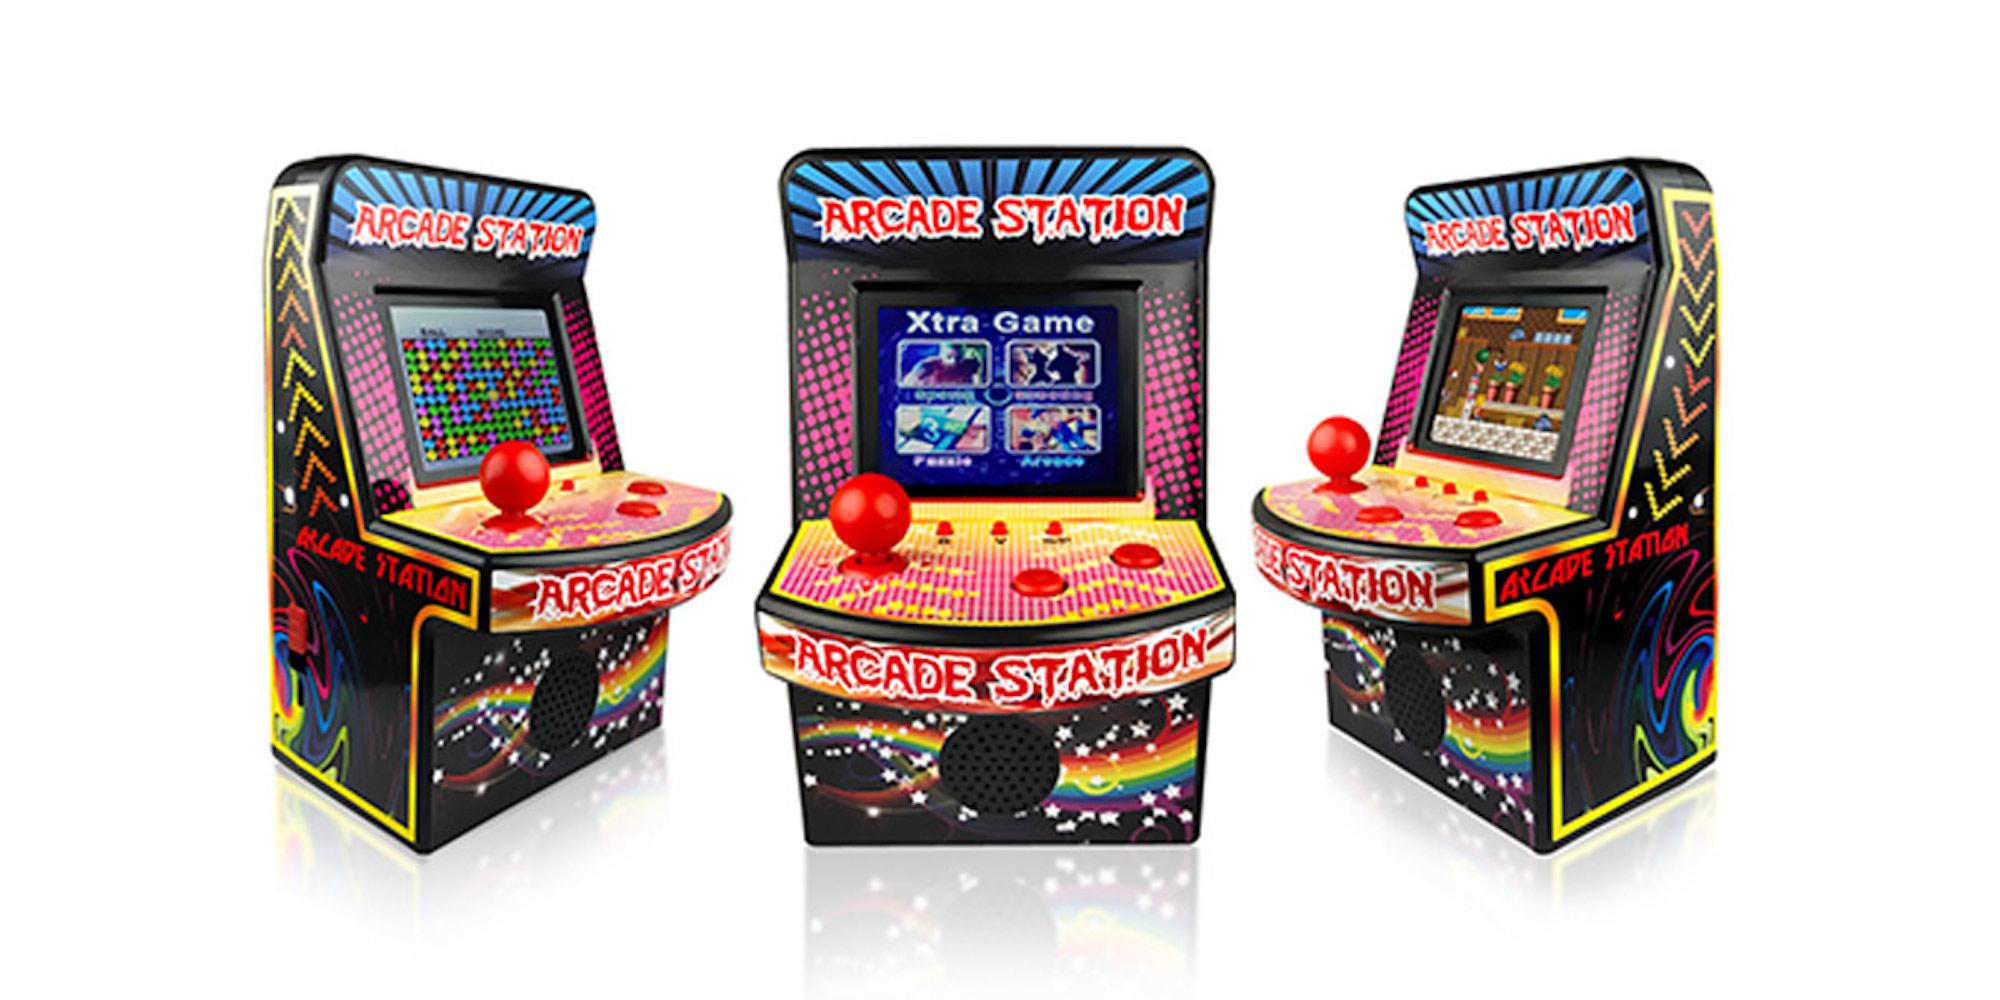 This mini retro arcade machine w/ 250 titles is now just $30